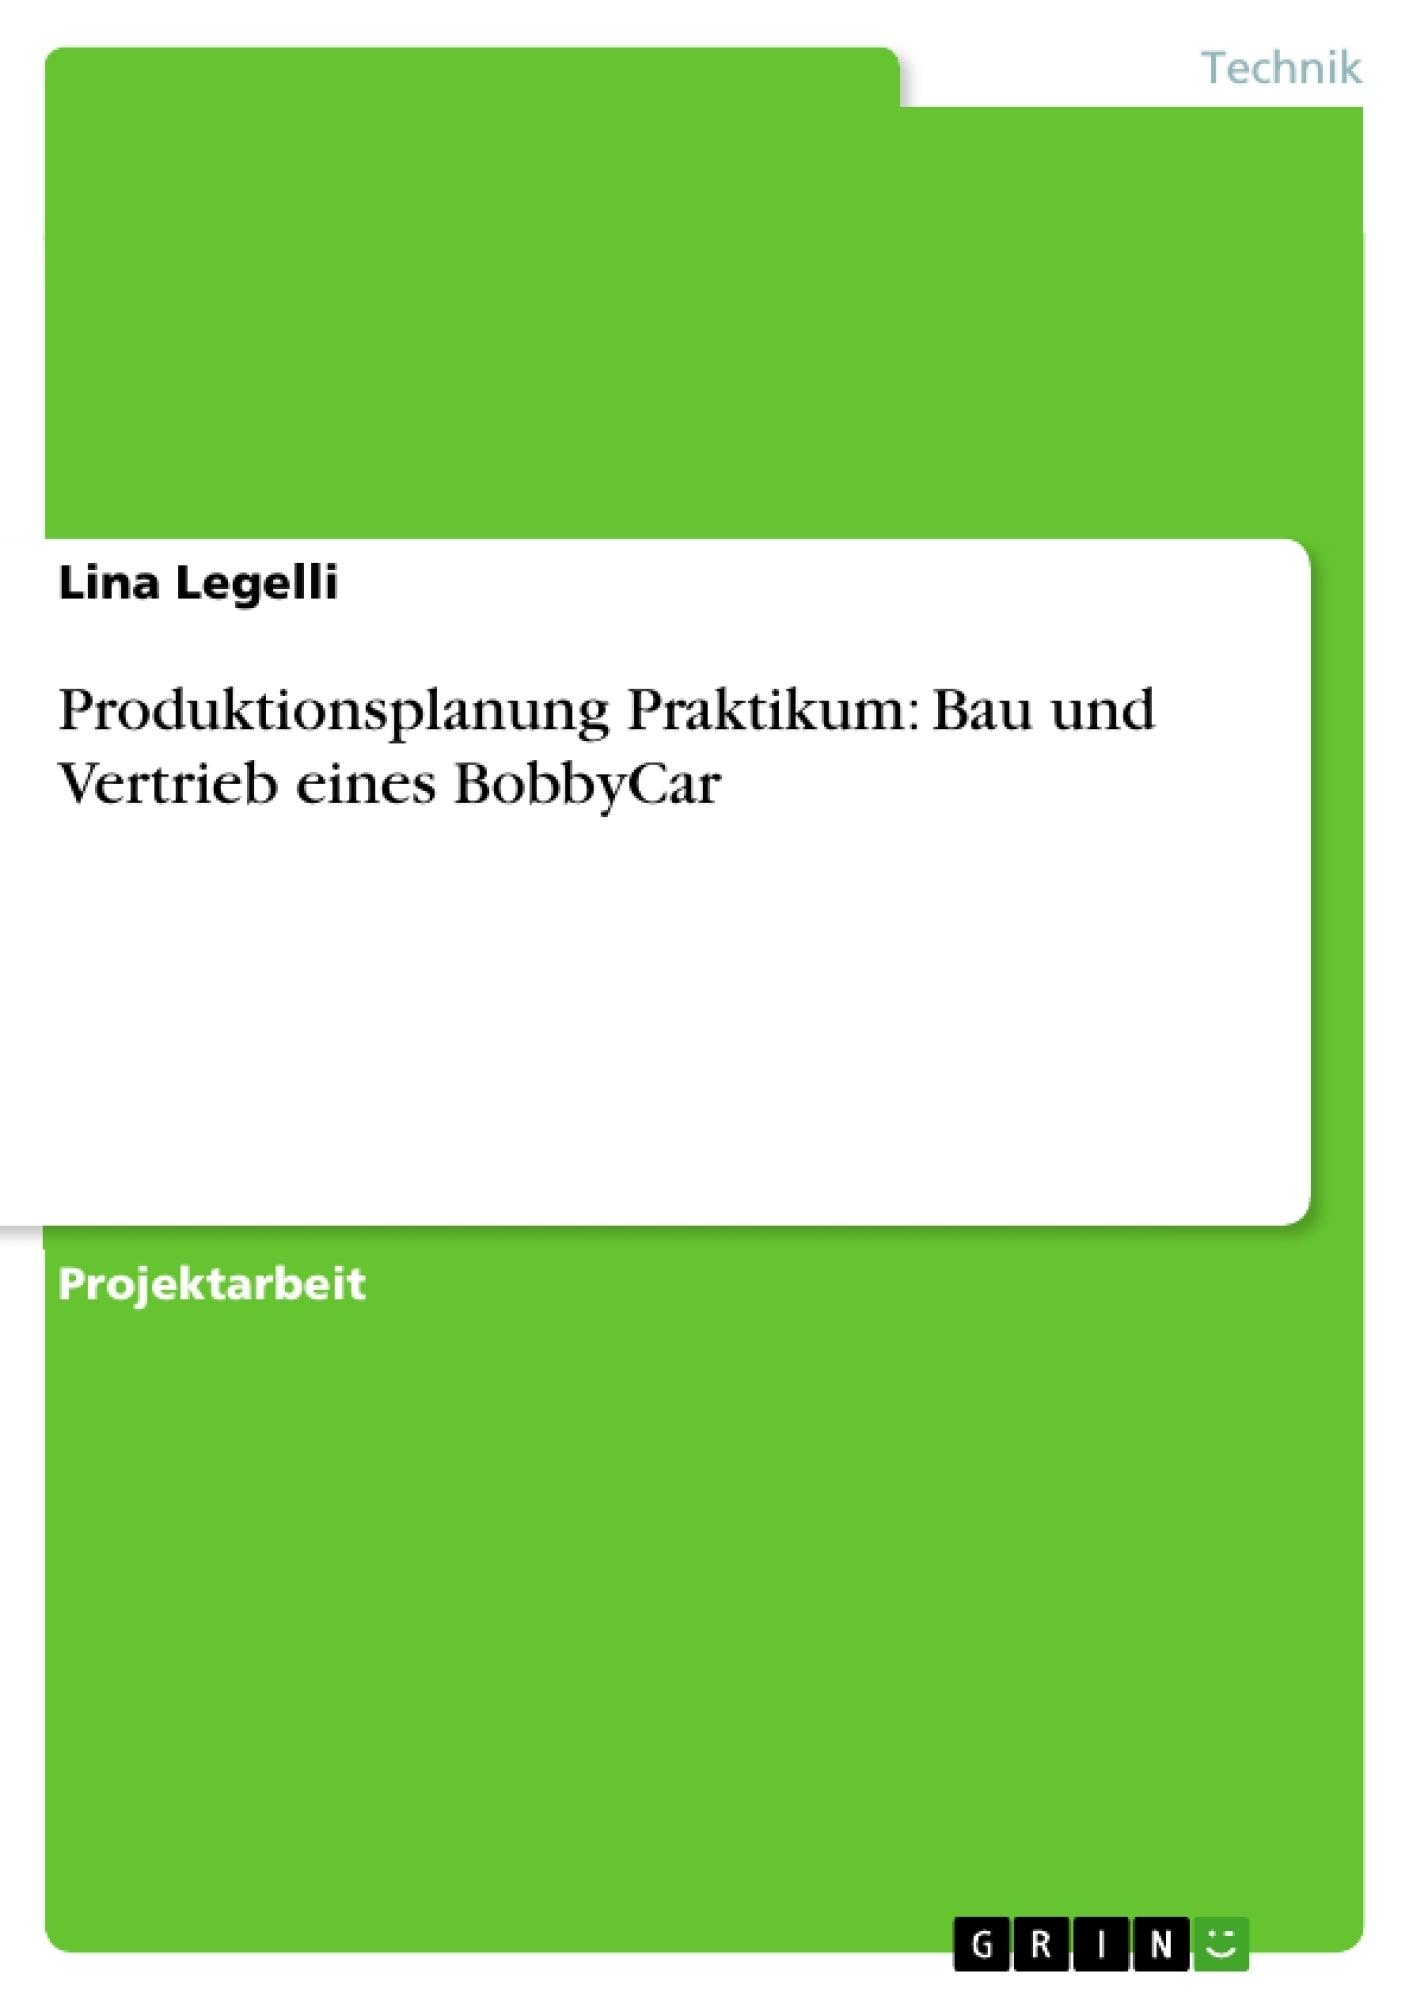 Titel: Produktionsplanung Praktikum: Bau und Vertrieb eines BobbyCar